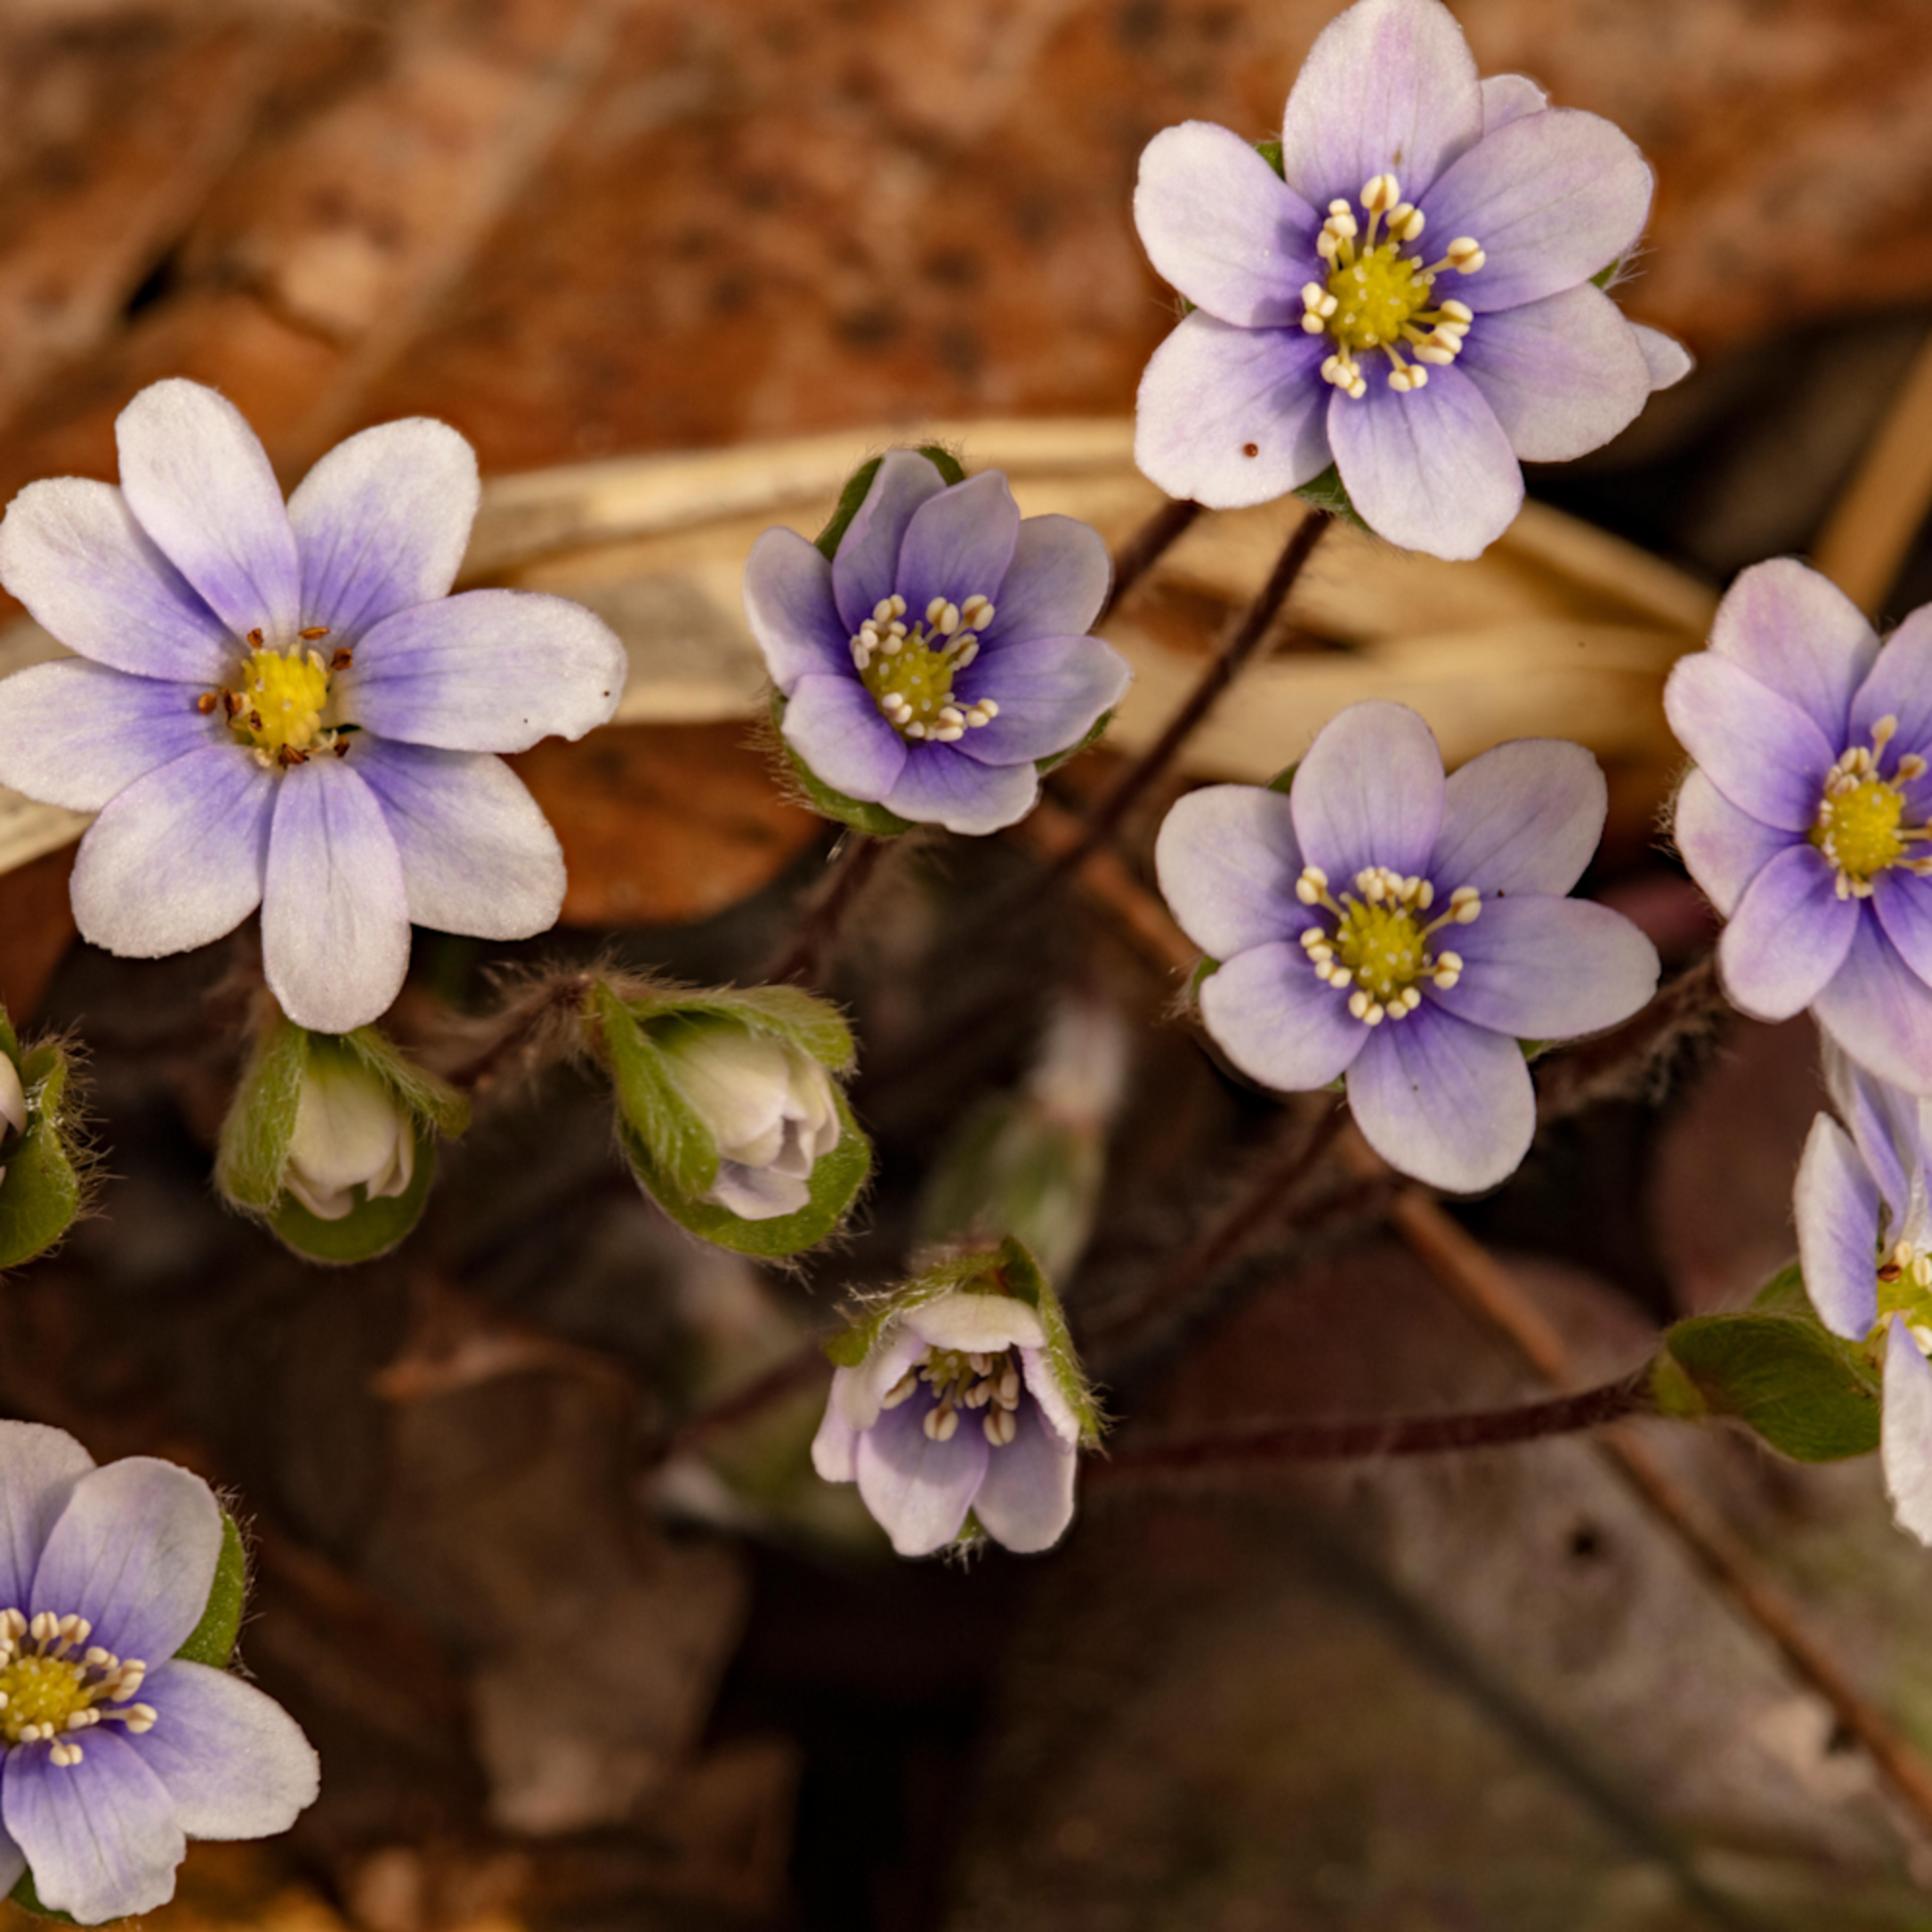 Purple liverwort pennywort 0234 fss jdgm4o